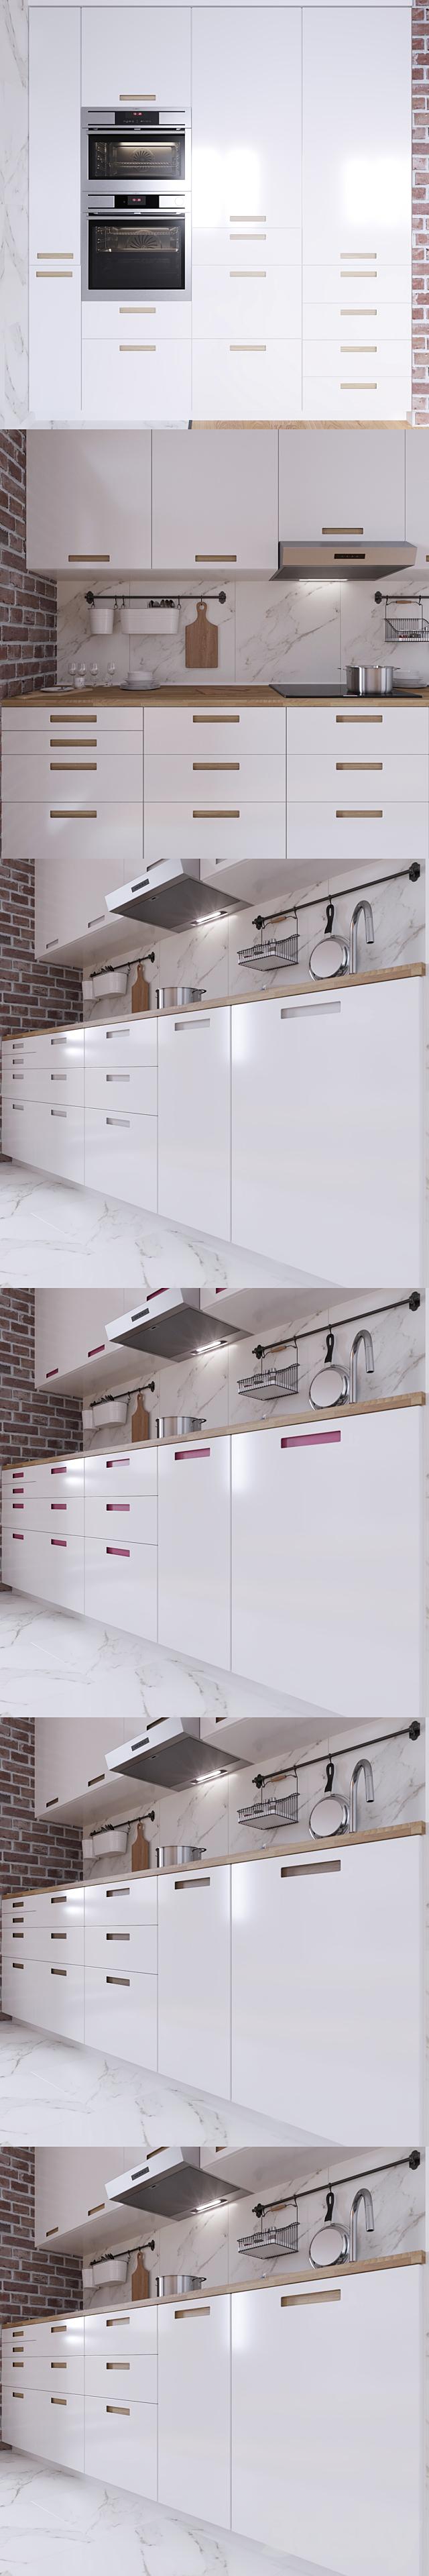 4d models: Kitchen - IKEA mÄRSTA